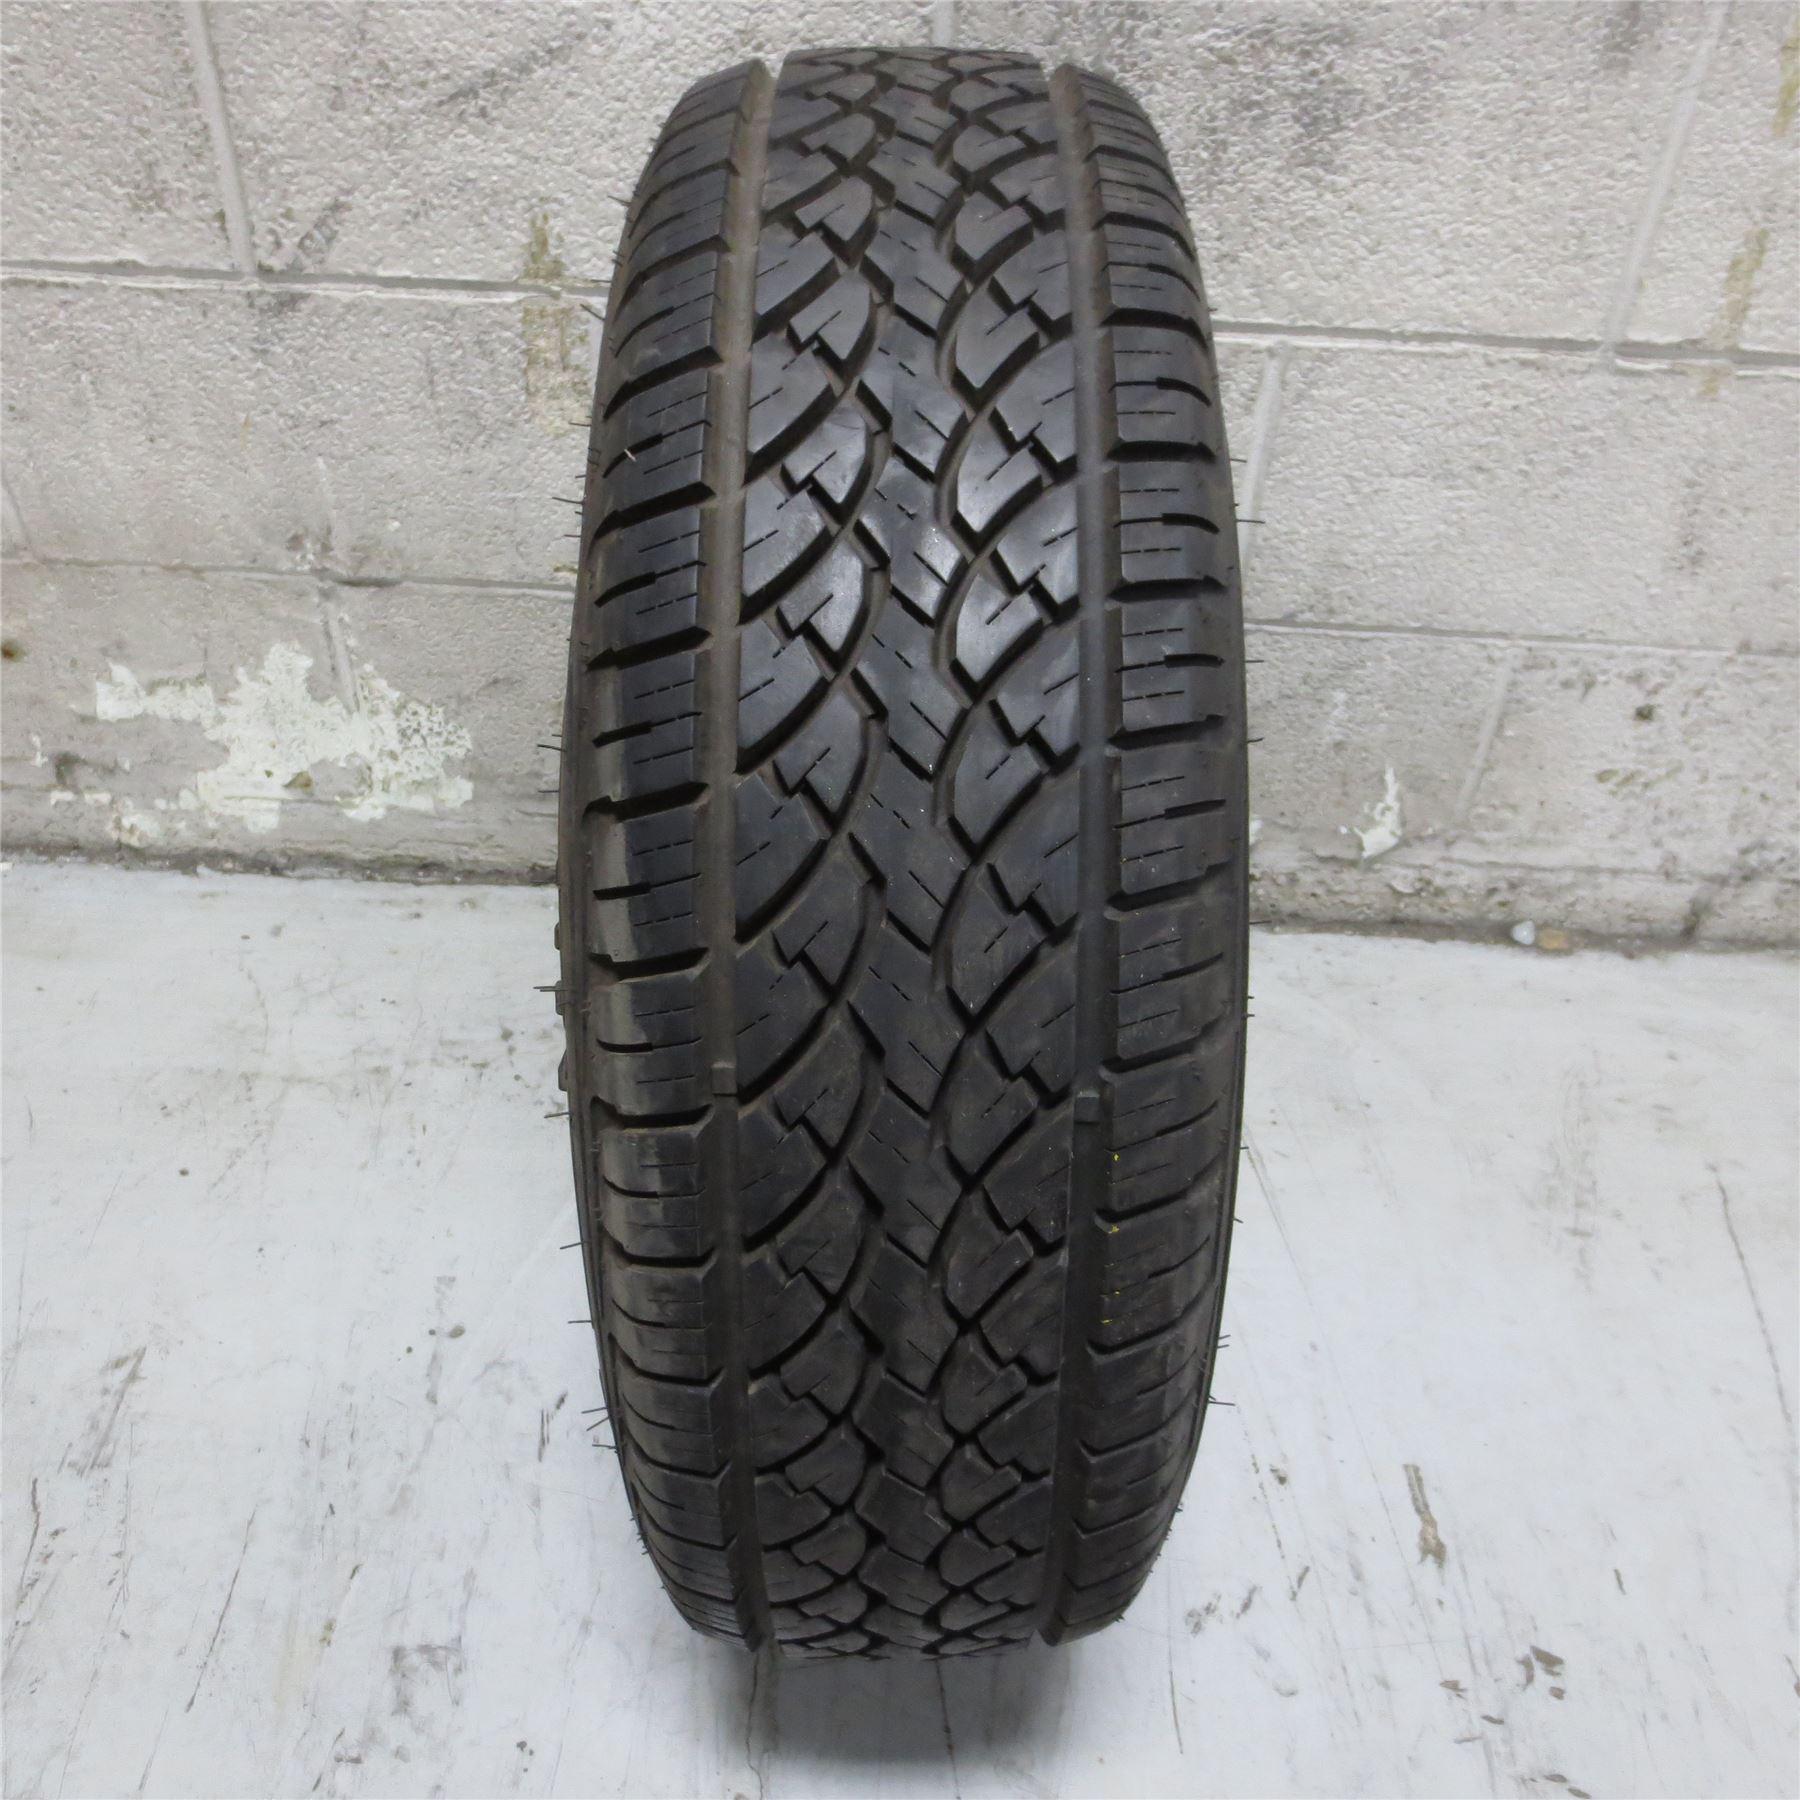 215/70R16 Zenna Advanta SUV 99T Tire (11-11.5/32nd) NO REPAIRS! | eBay